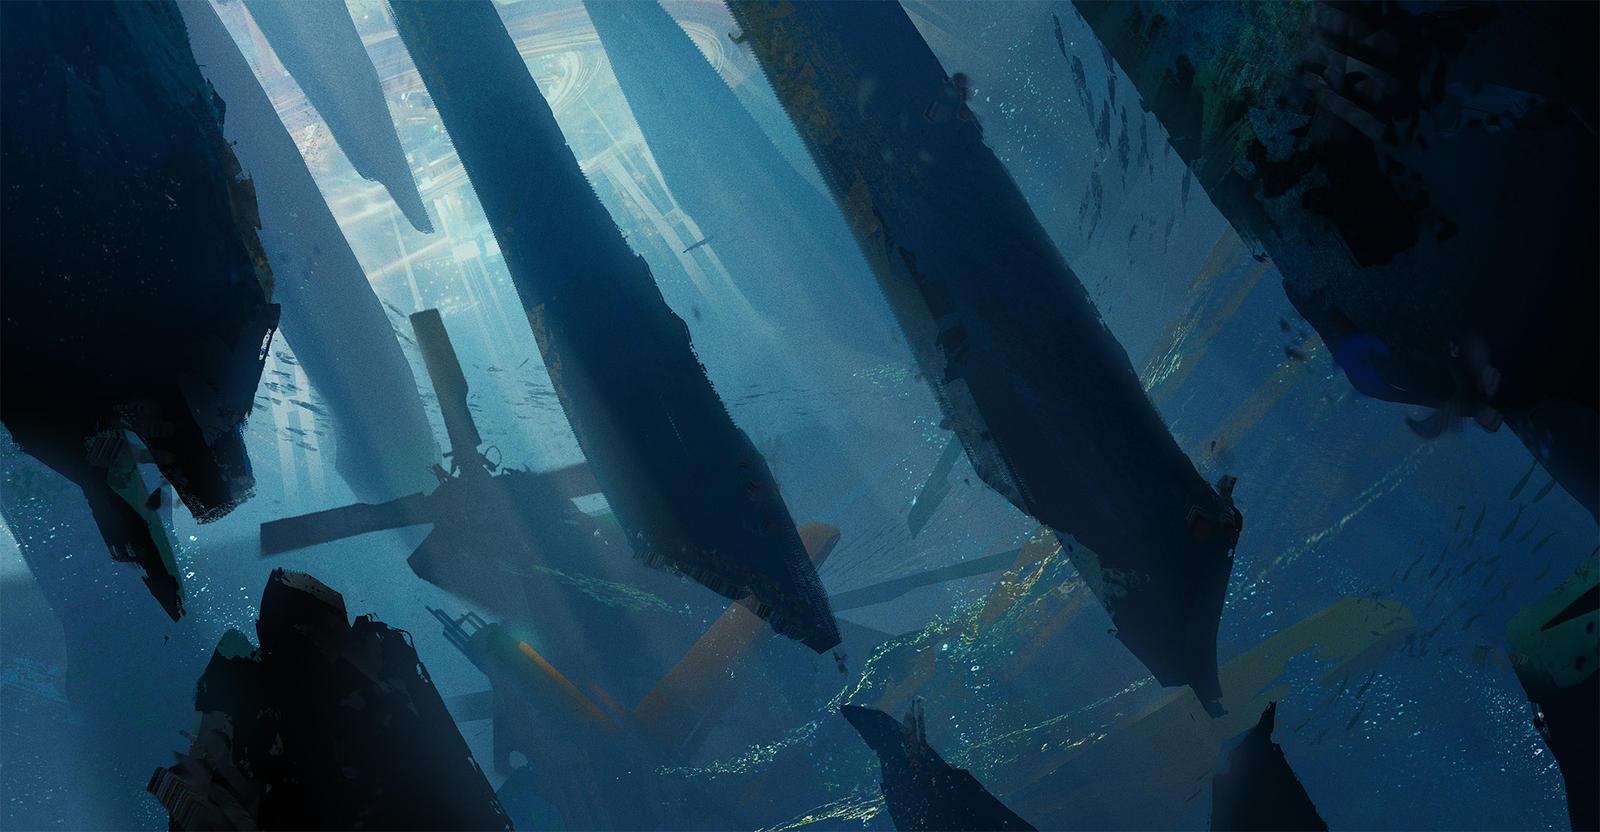 Underwater sketch by Stefana-Tserk